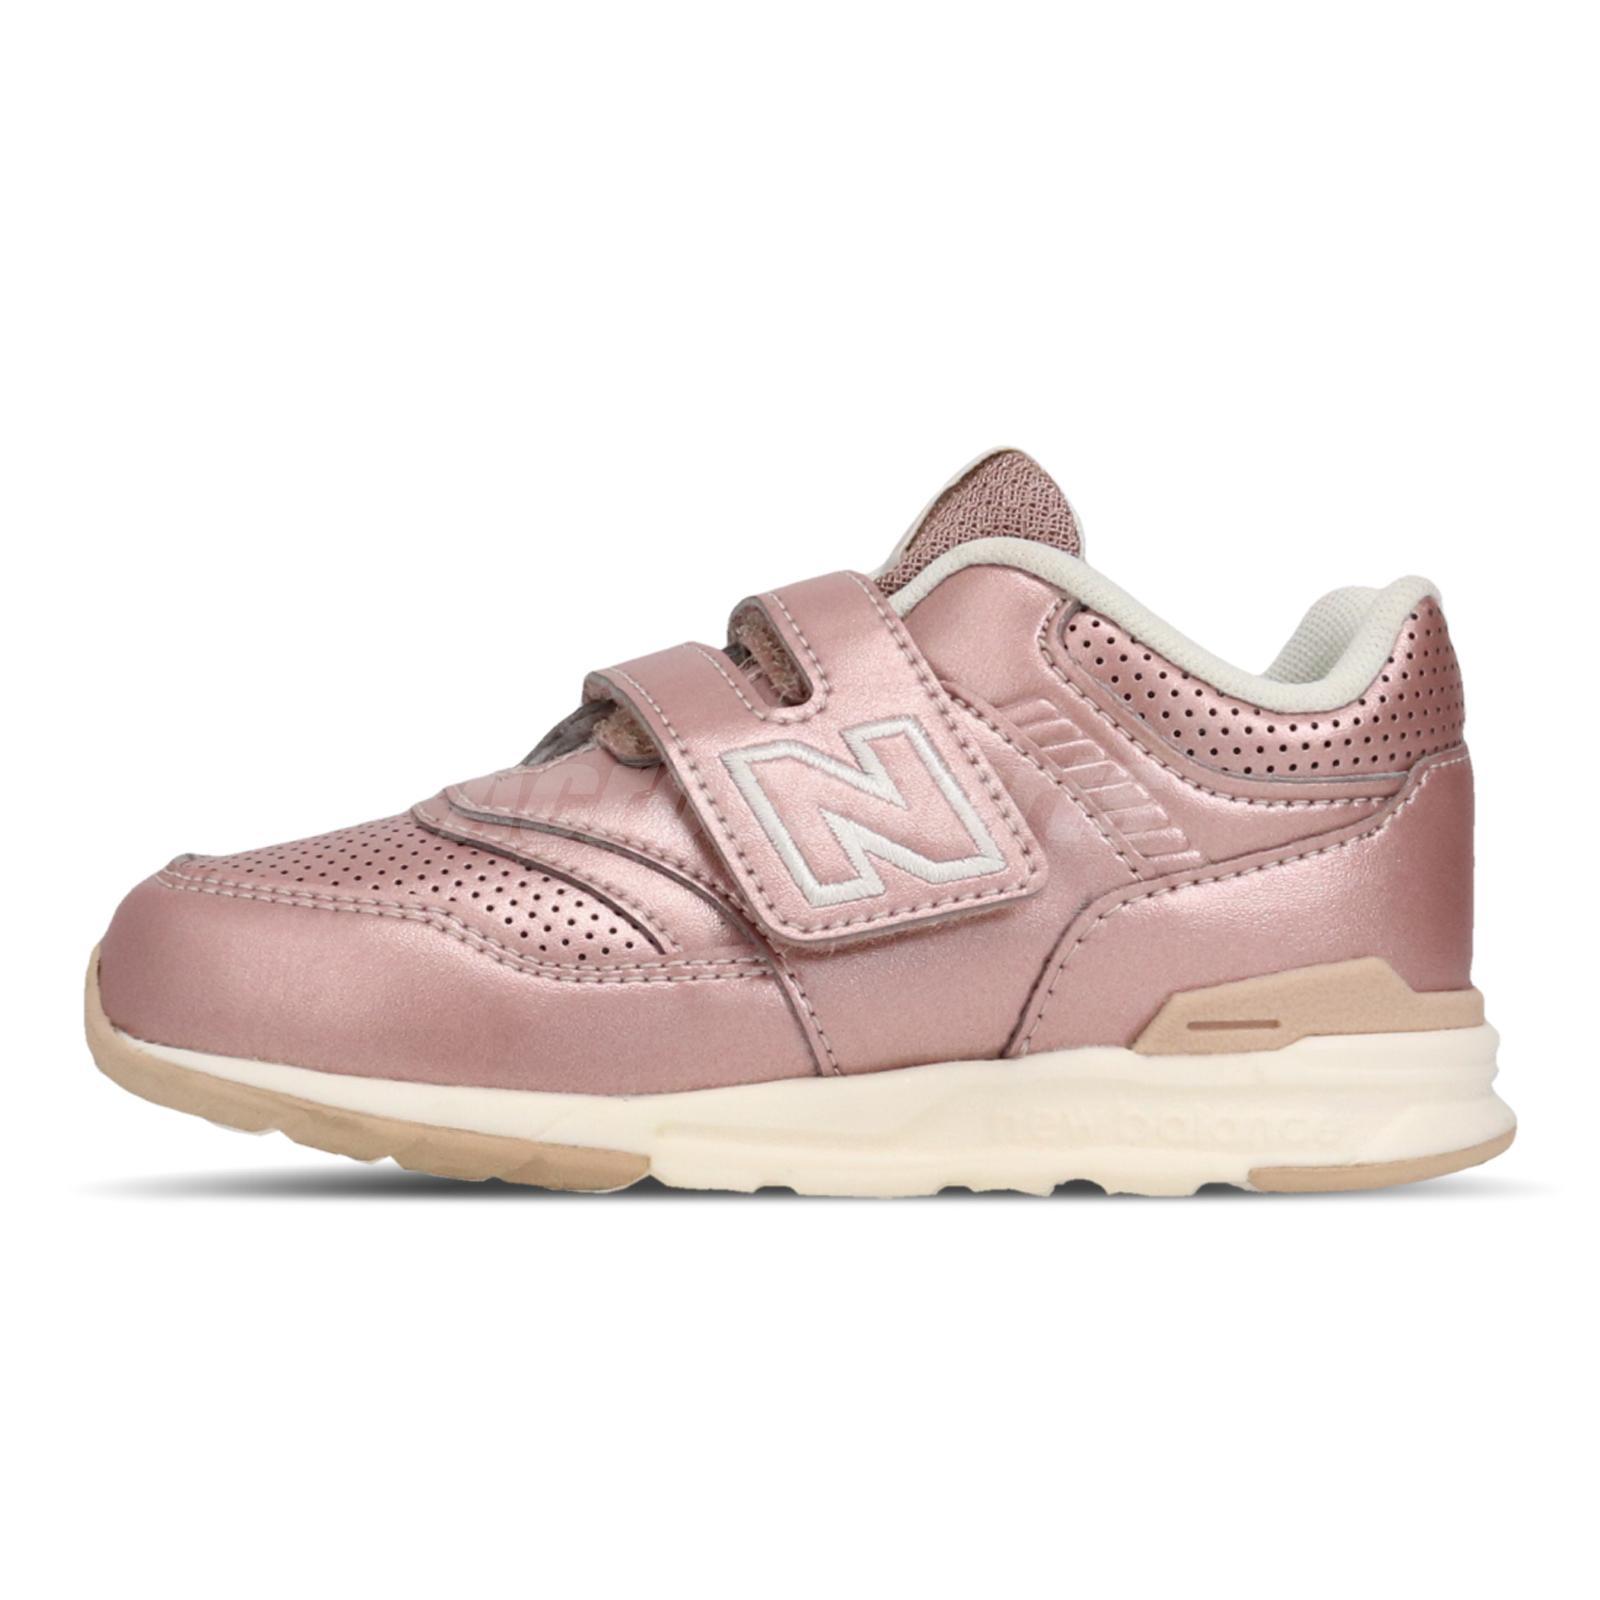 New Balance 997H Wide Metallic Pink